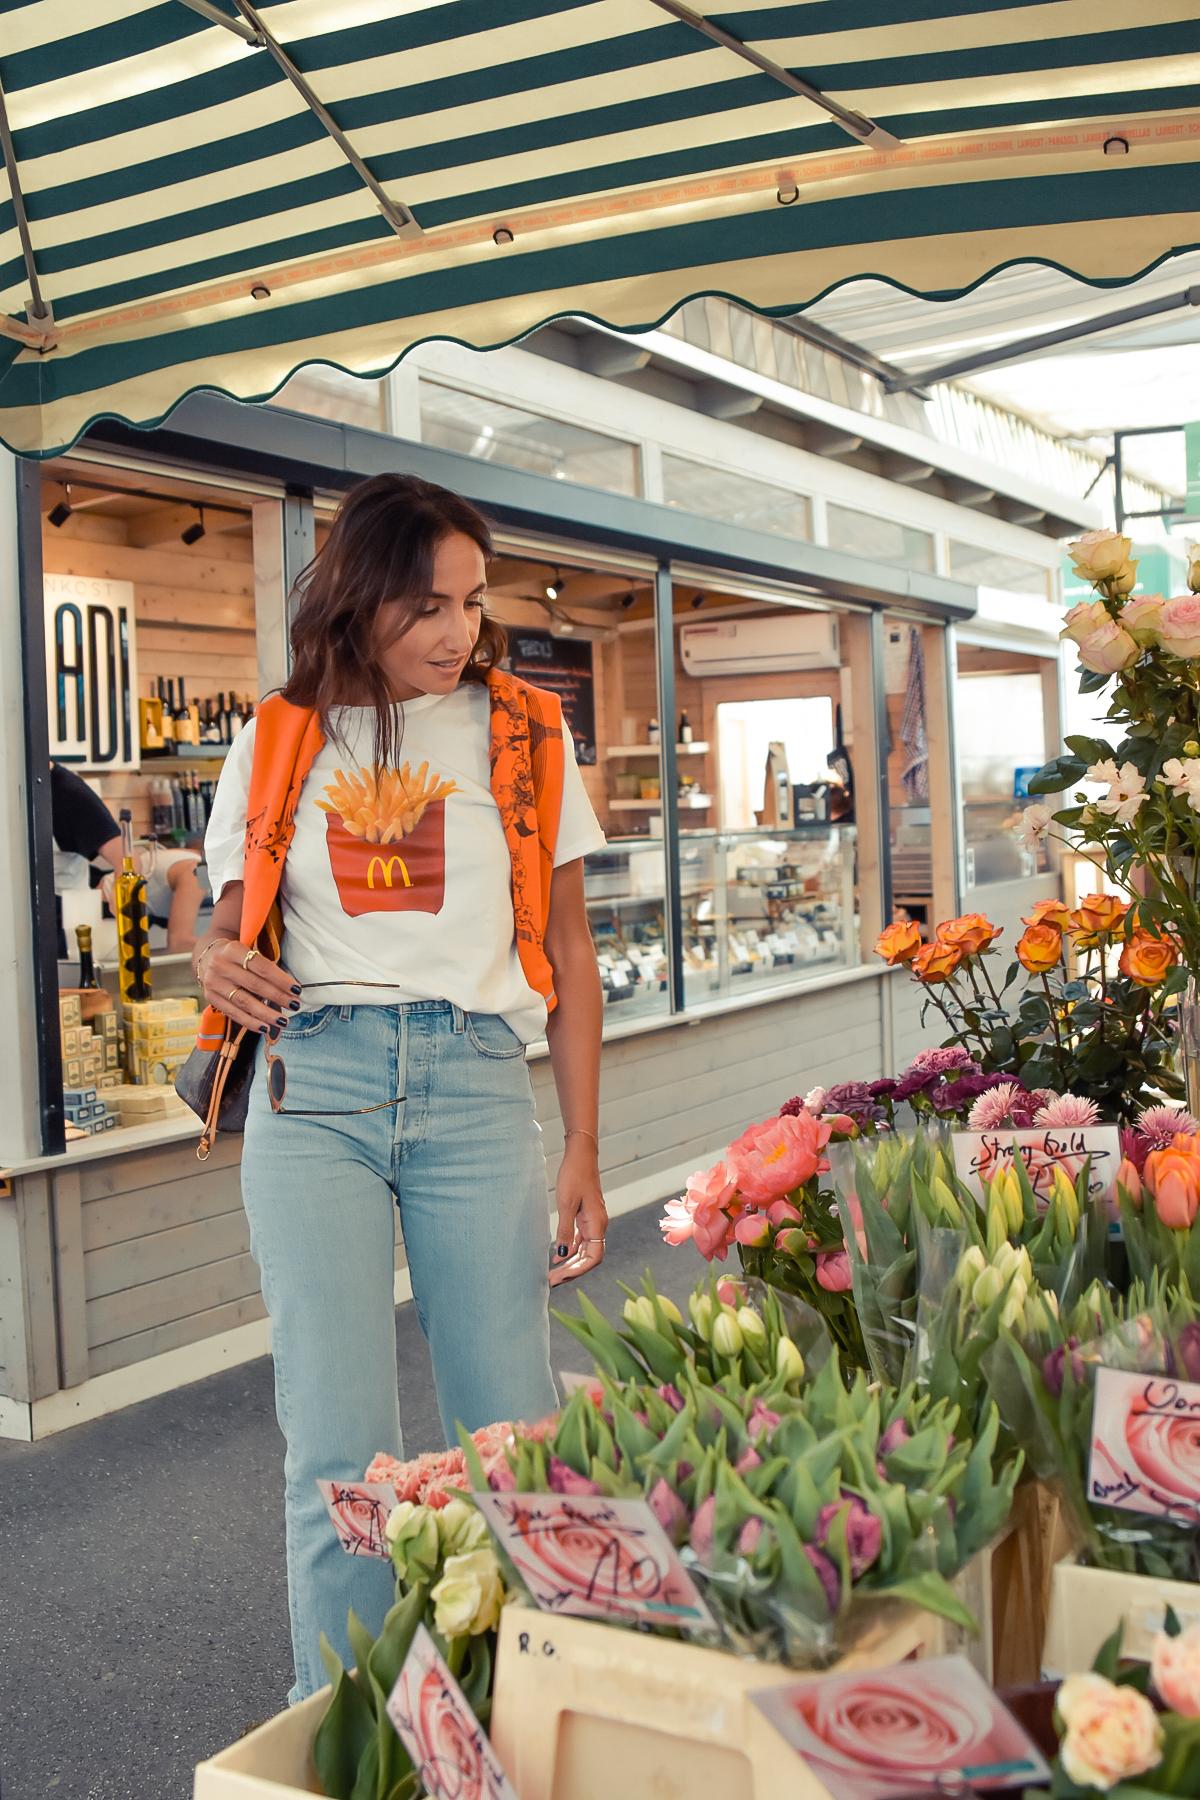 el-blog-de-silvia-viajar-dusseldorf-jersey-geometrico-jeans-levis-06